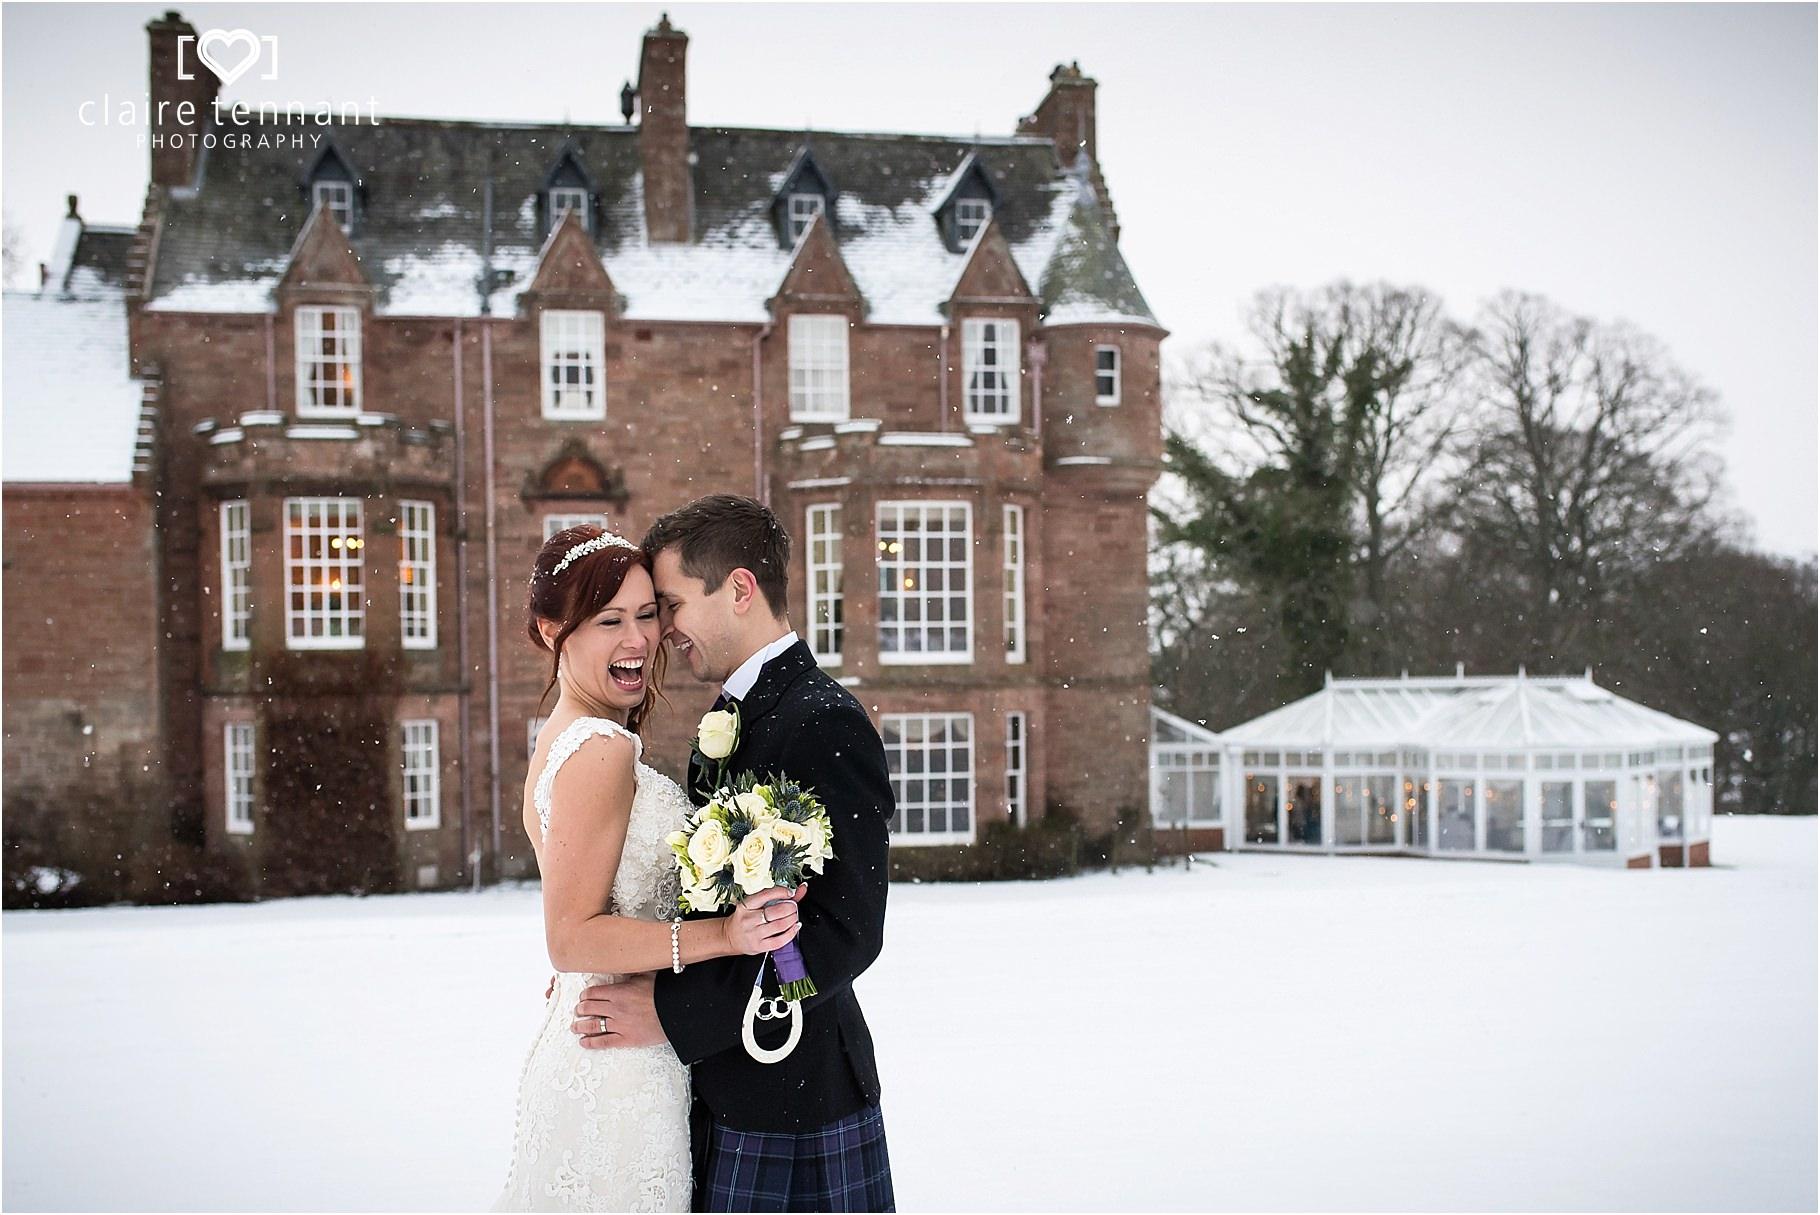 2016 wedding photography highlights Edinburgh